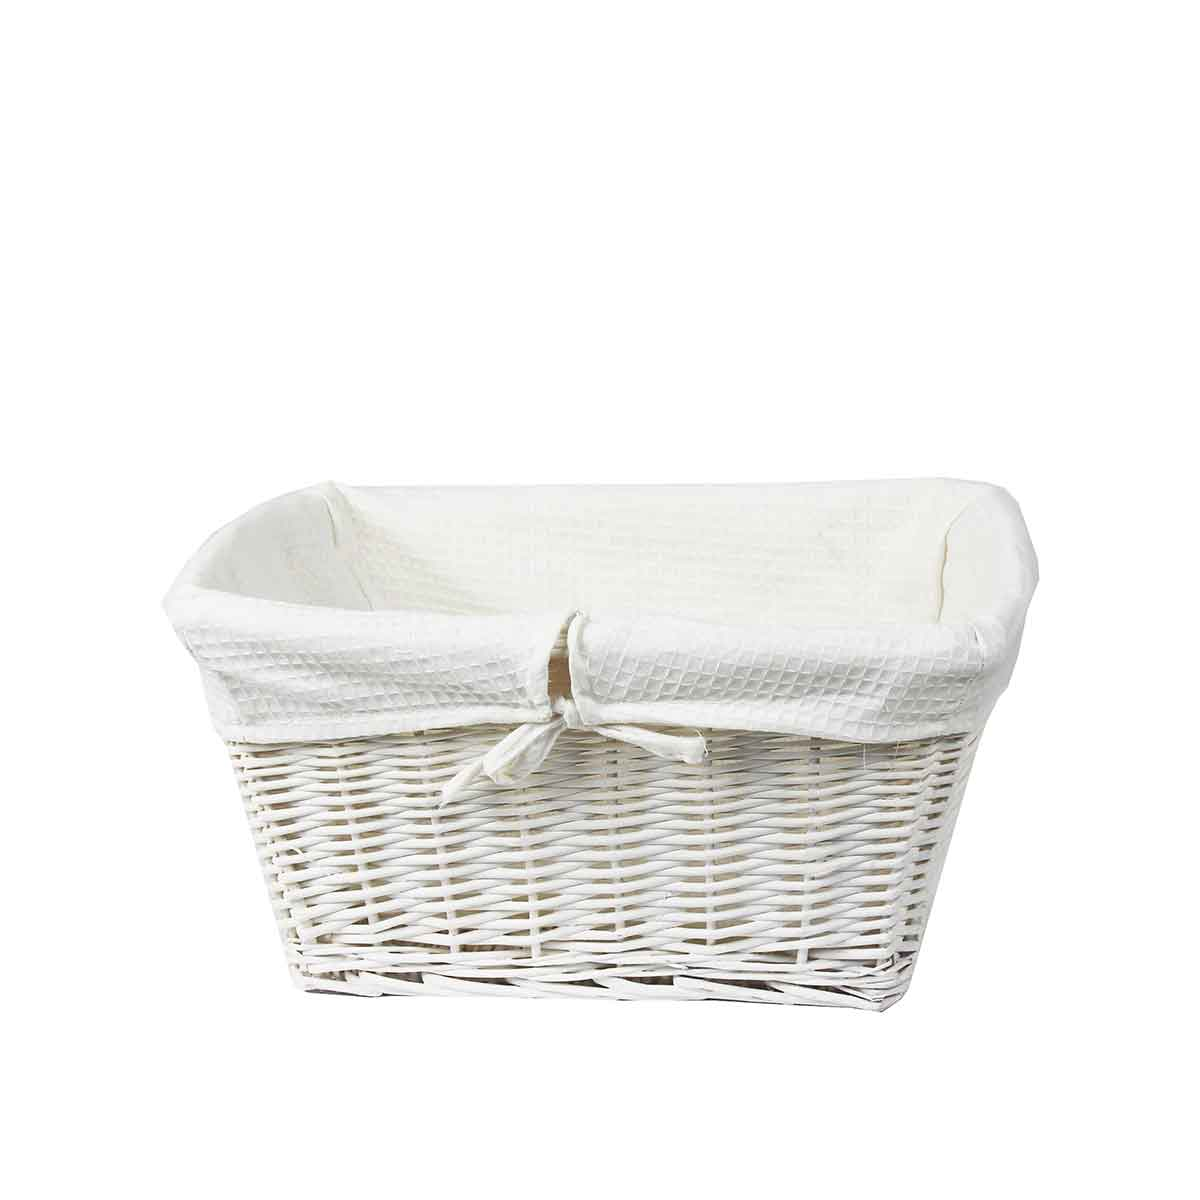 Panier osier blanc avec housse tissu blanc panier en osier - Panier en osier ikea ...